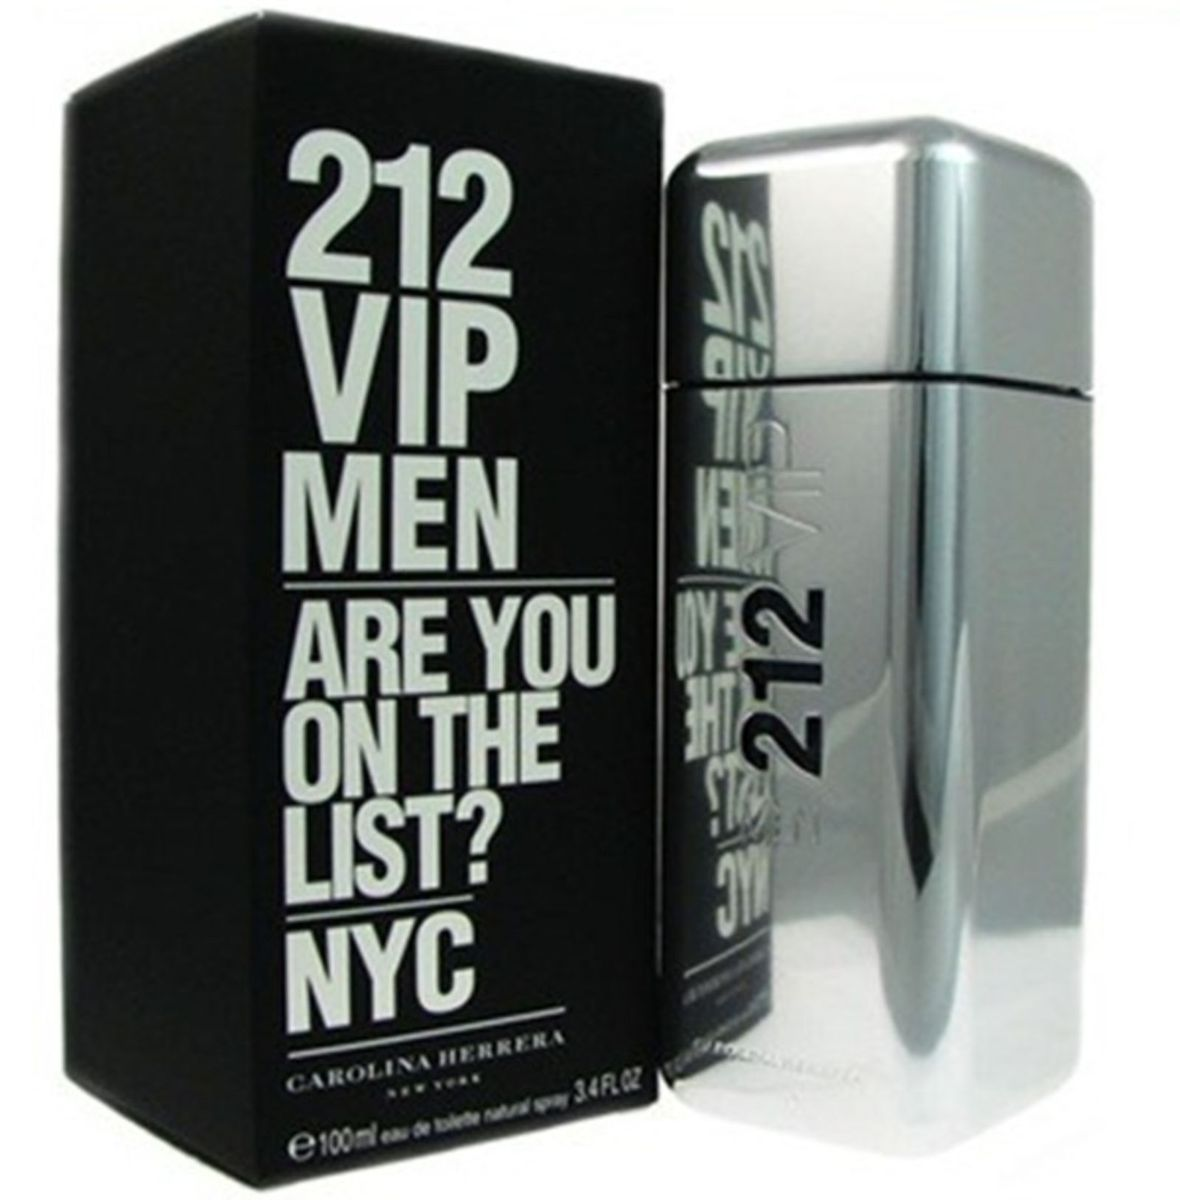 79ffcee8de perfume 212 vip men 100ml - original - perfumes carolina herrera